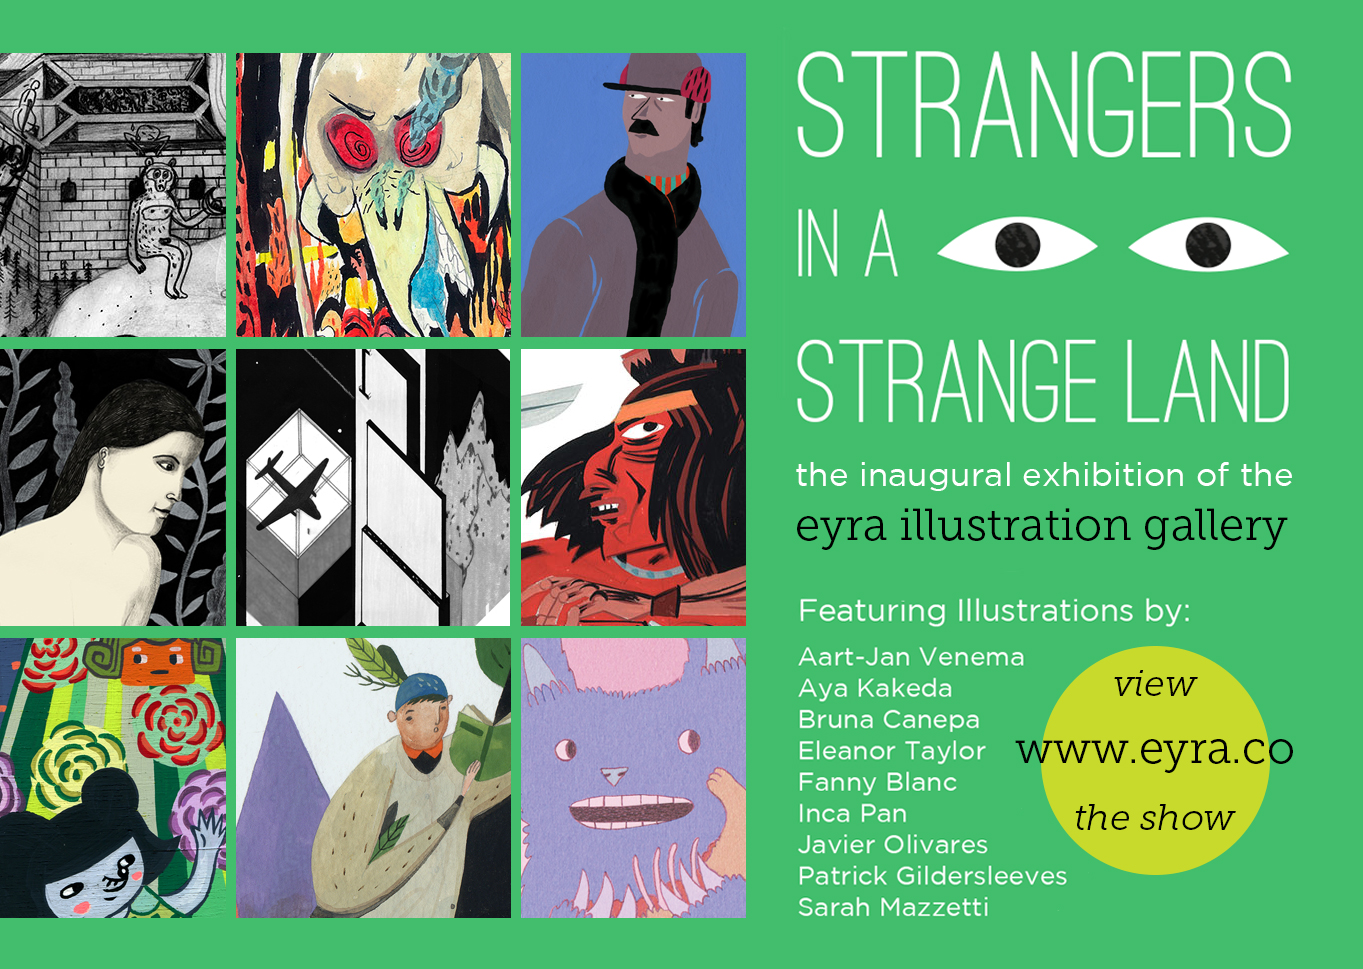 Strangers_in_a_Strange_Land